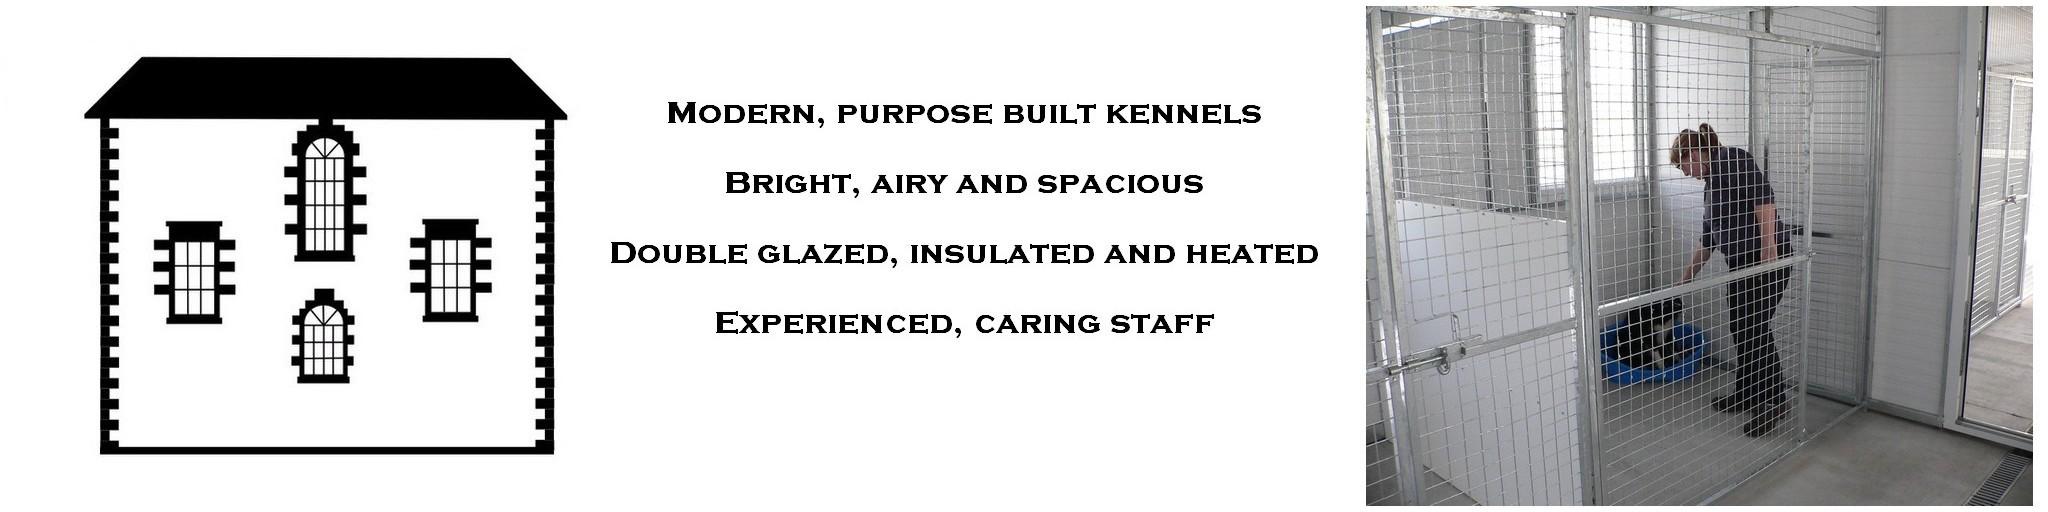 Inside the kennels